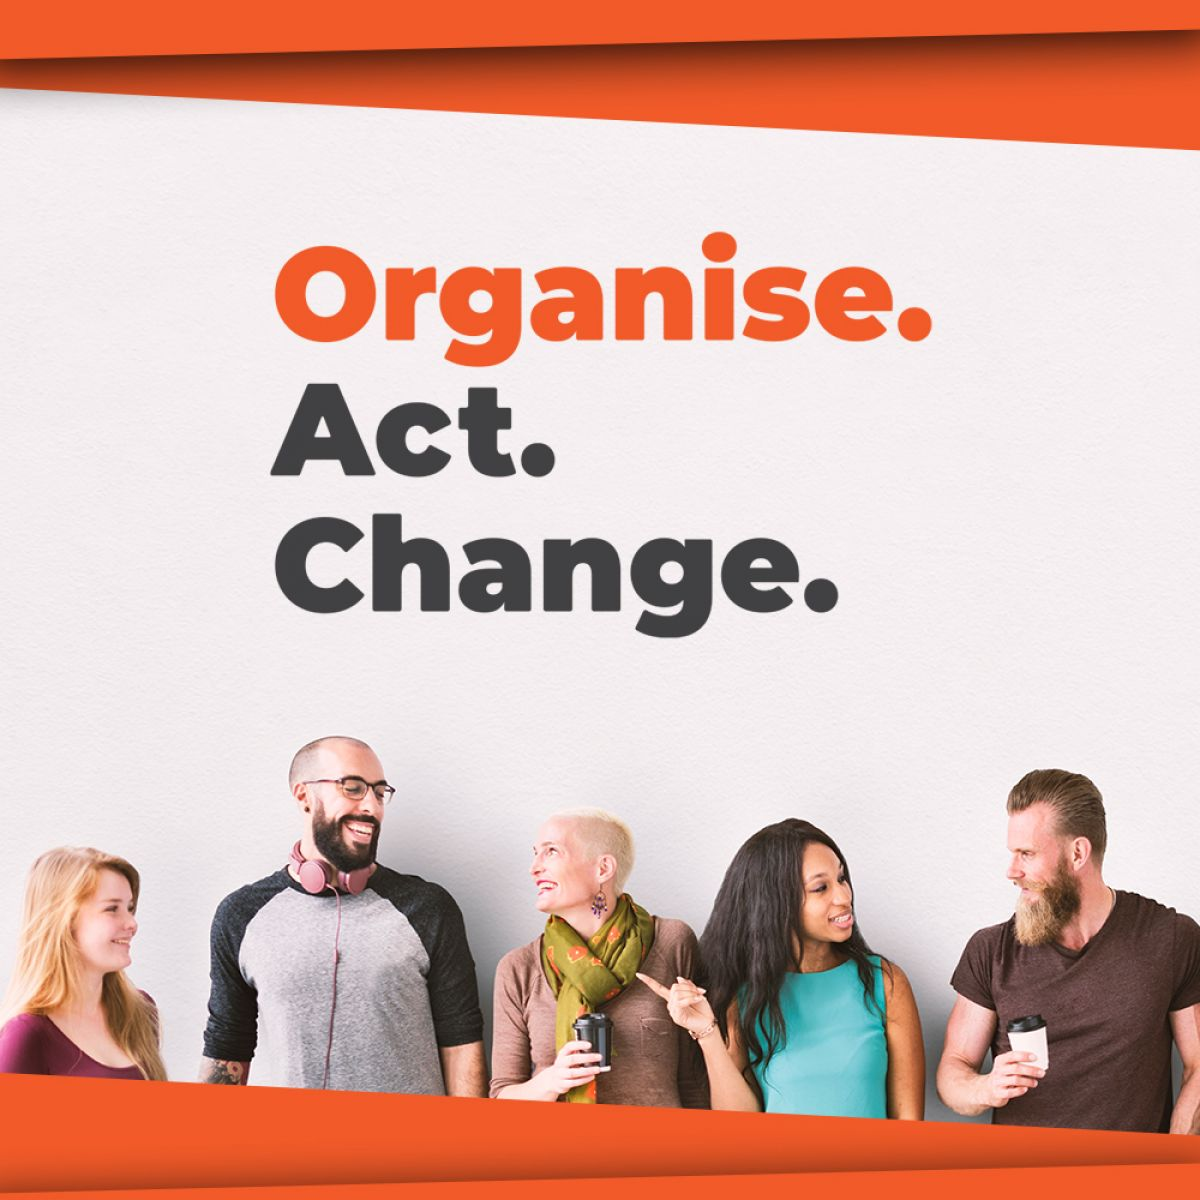 Organise. Act. Change. Logo